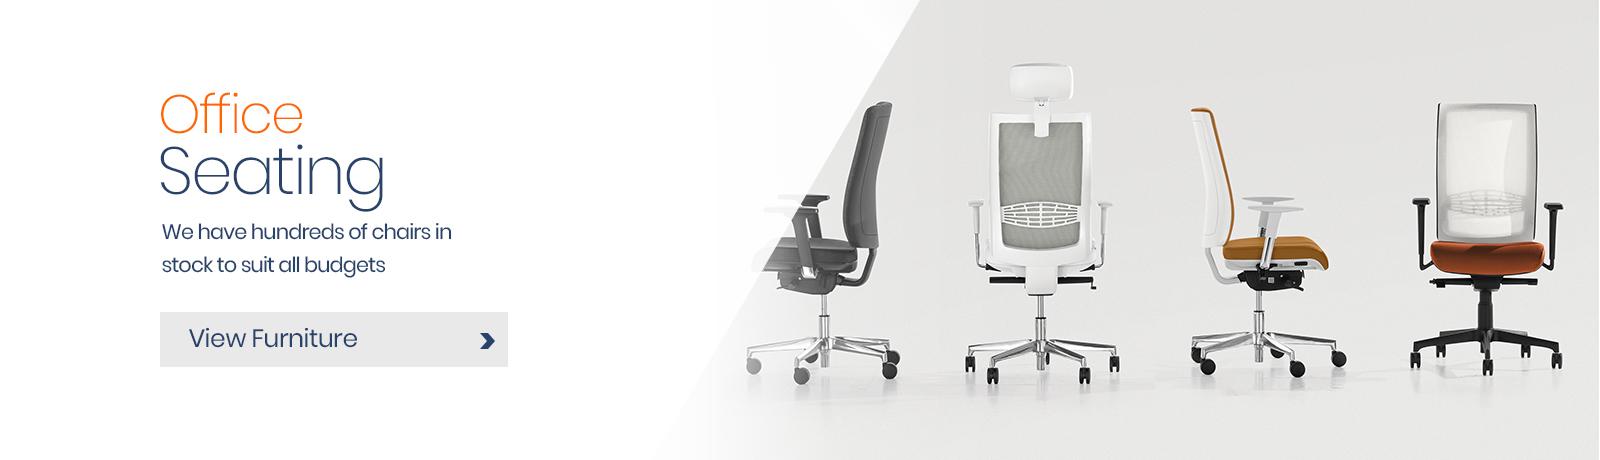 Slider 2 - Office Seating